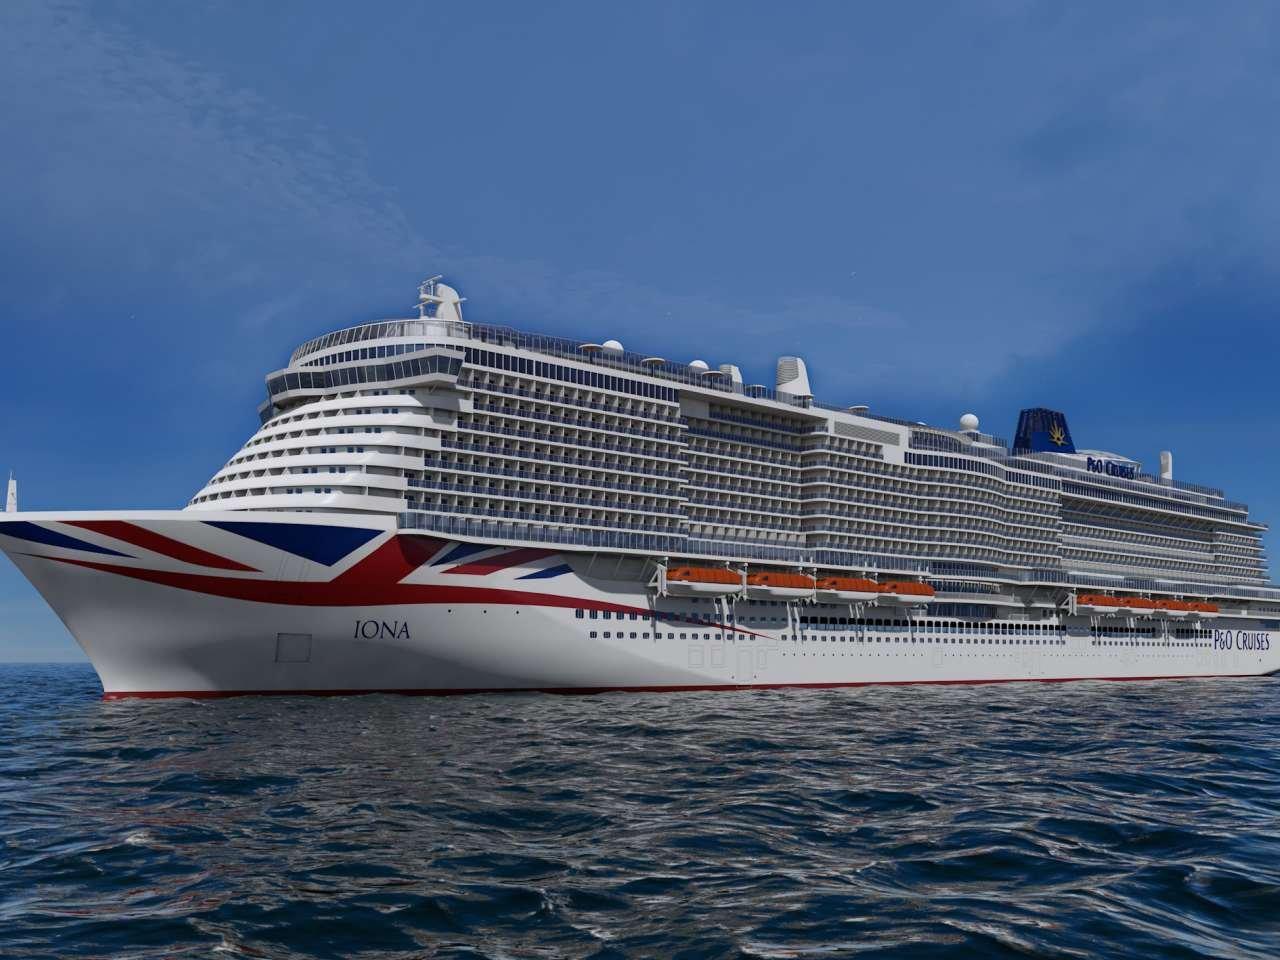 Iona Cruise Ship & Cruise Deals   P&o Cruises P&o Cruise Calendar 2019